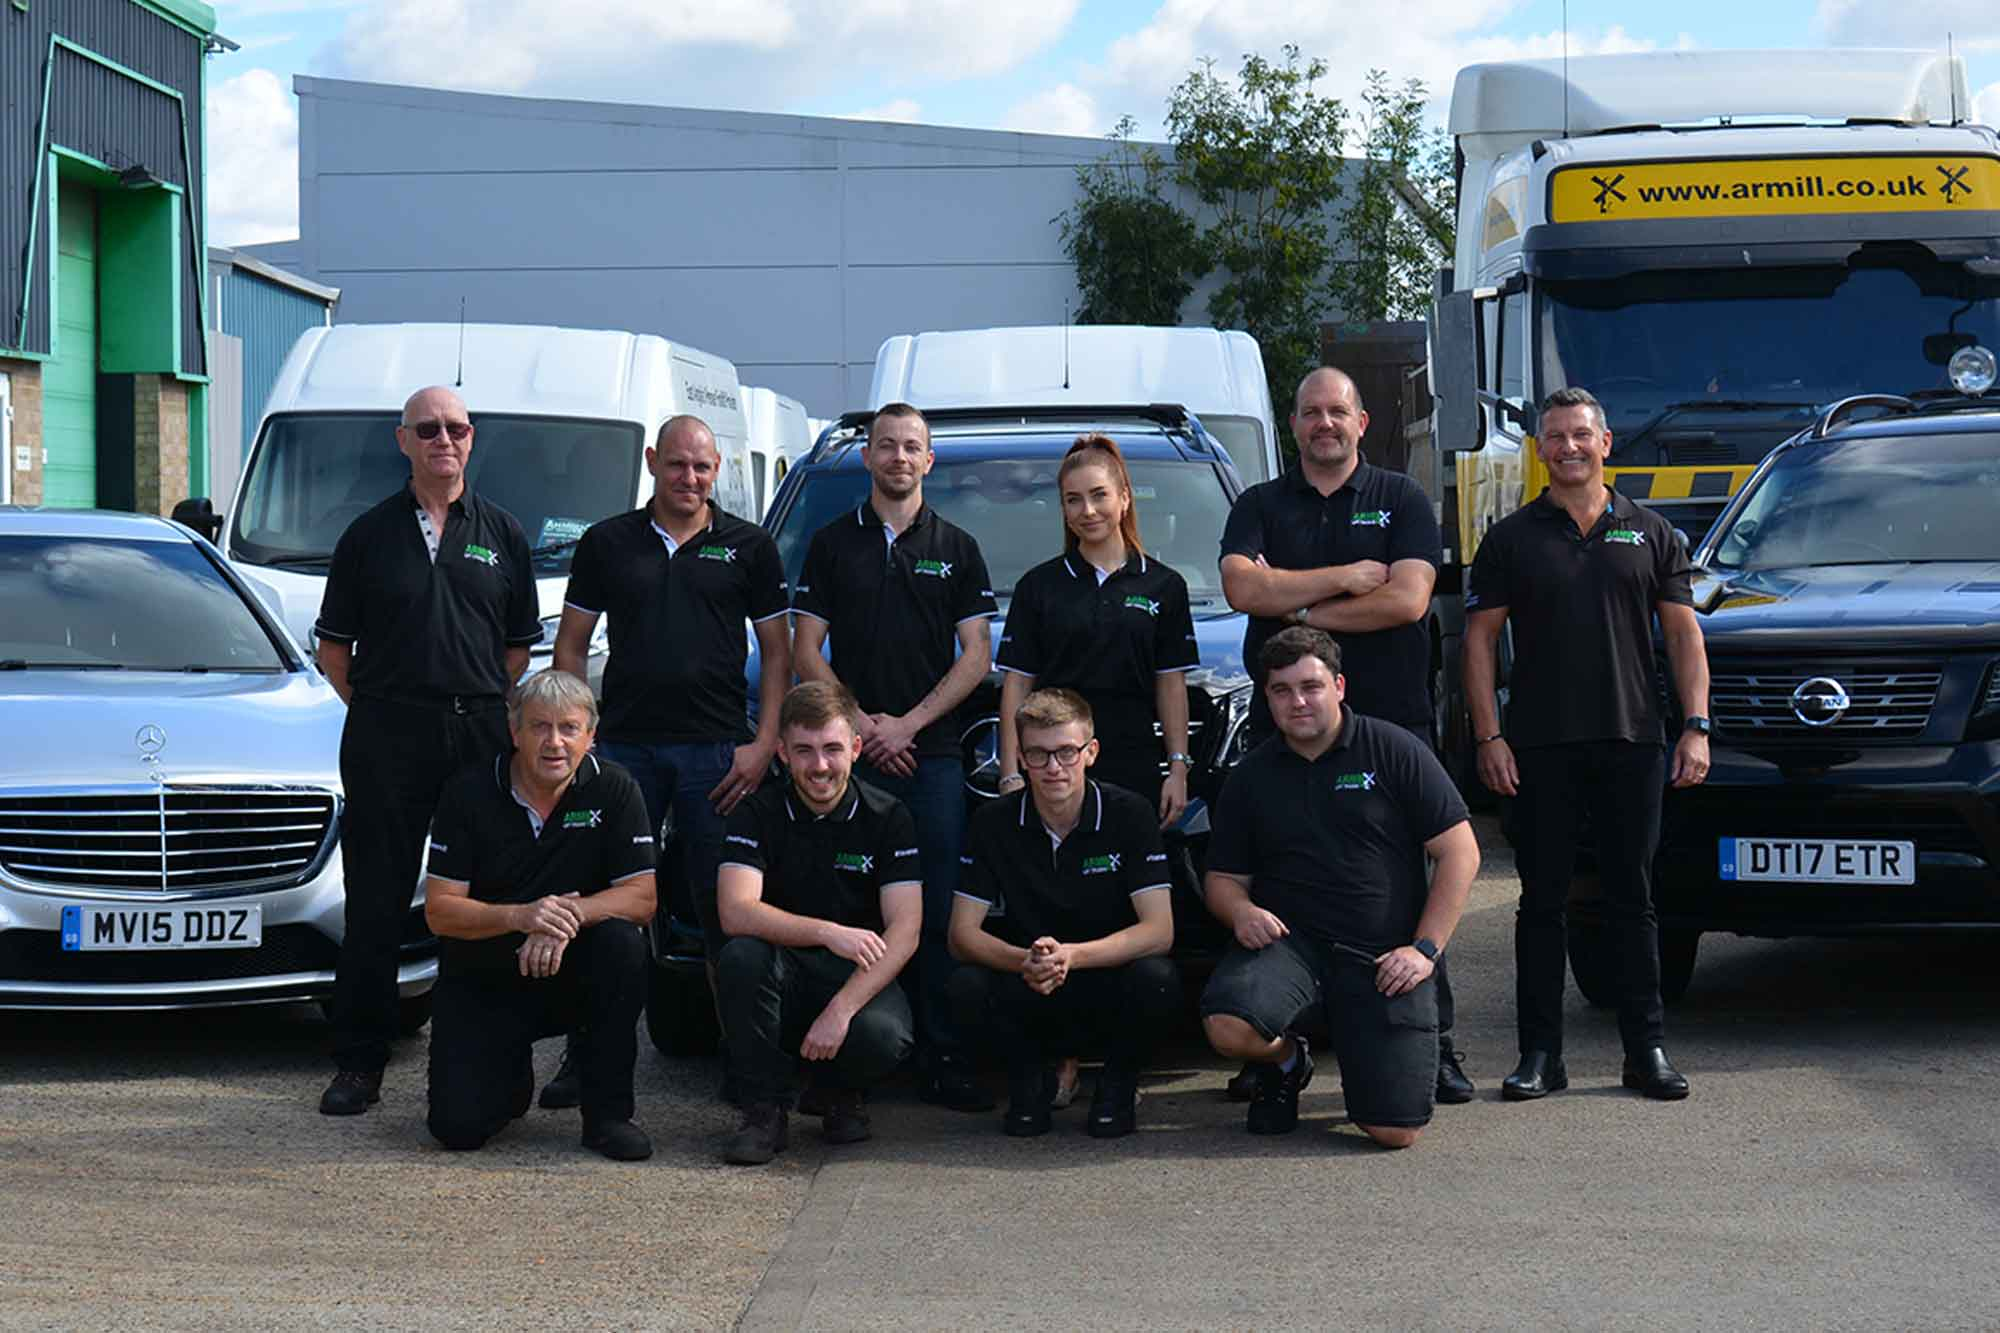 Armill Lift Trucks Team - About Us